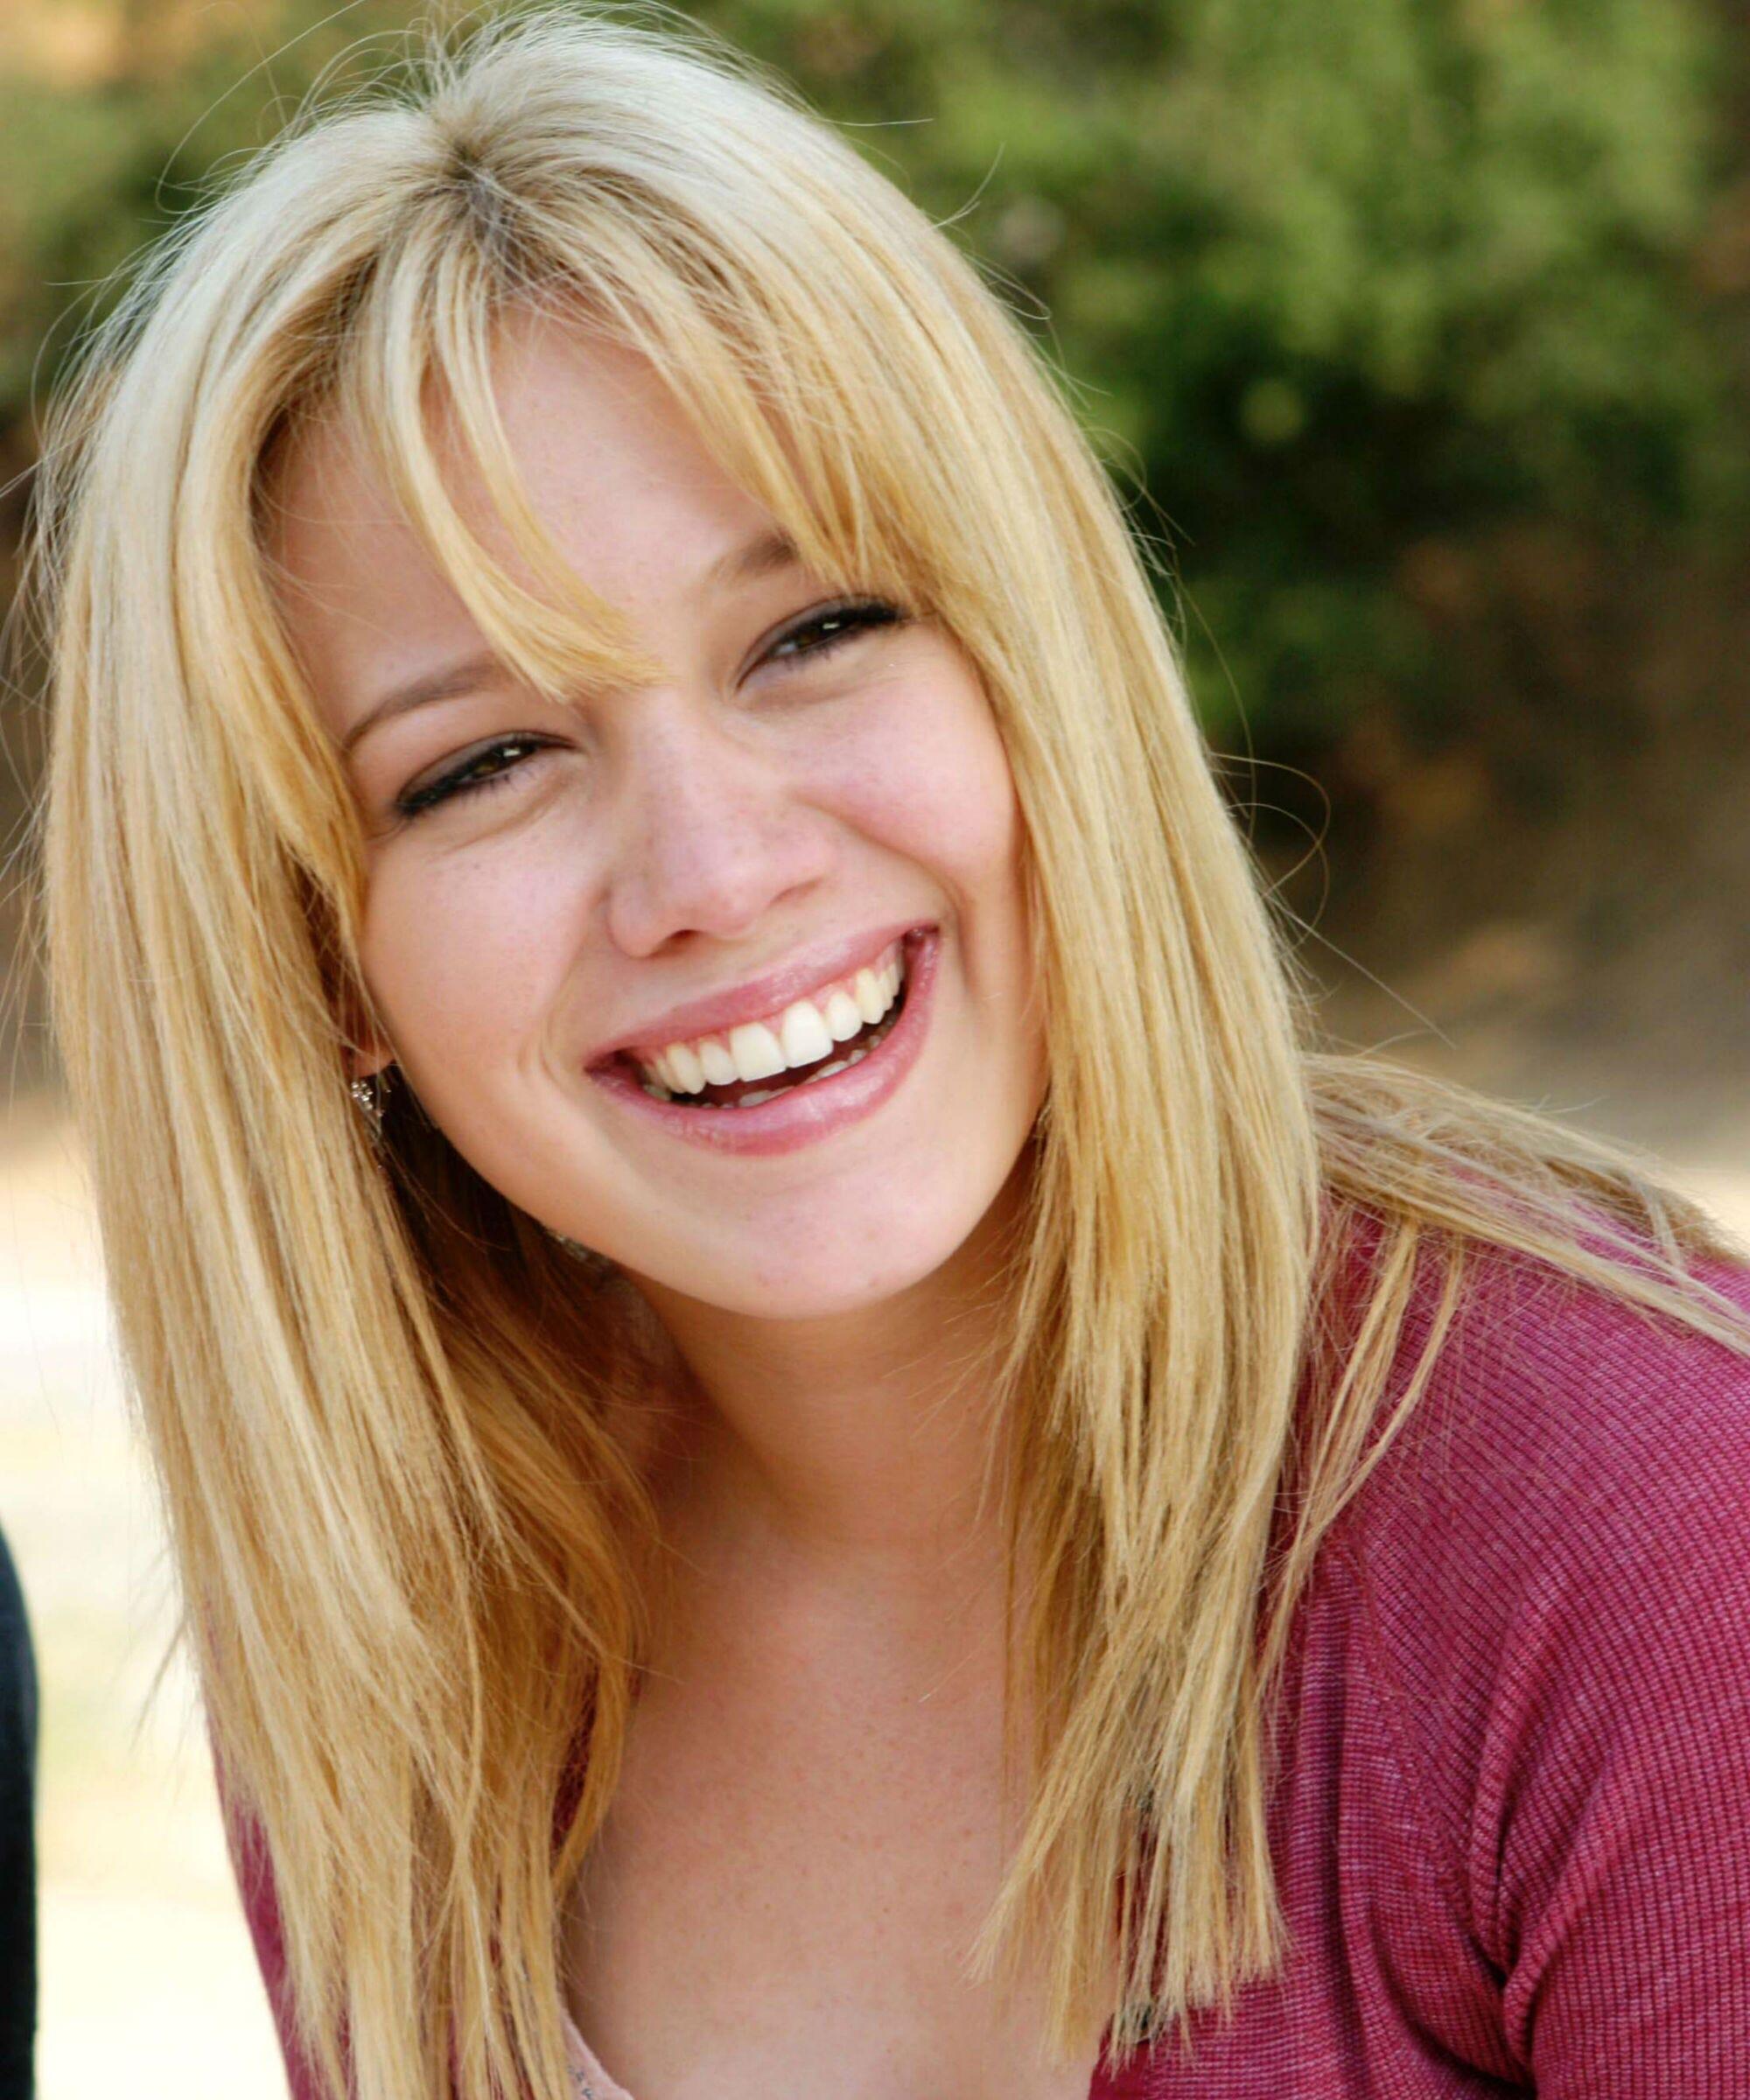 Hilary Duff Best 2000s Movies New Millennium Culture Hilary Duff Movies